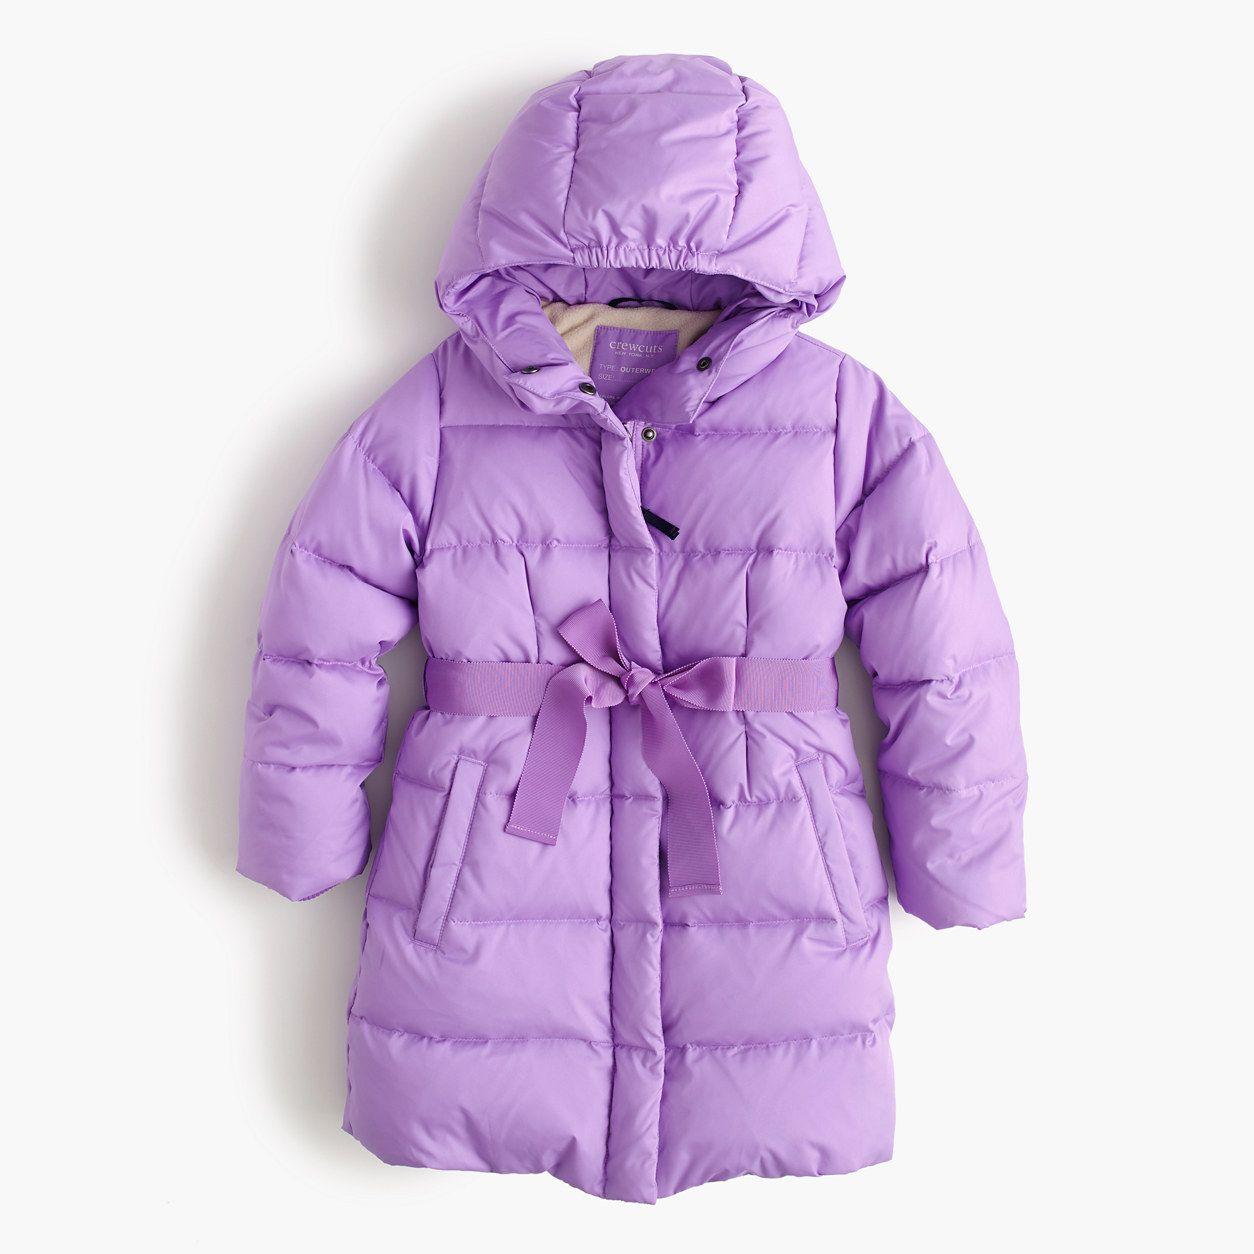 aea26a9b2b216 crewcuts Girls Long Powder Puffer (Size 3 Kid) Down Puffer Coat